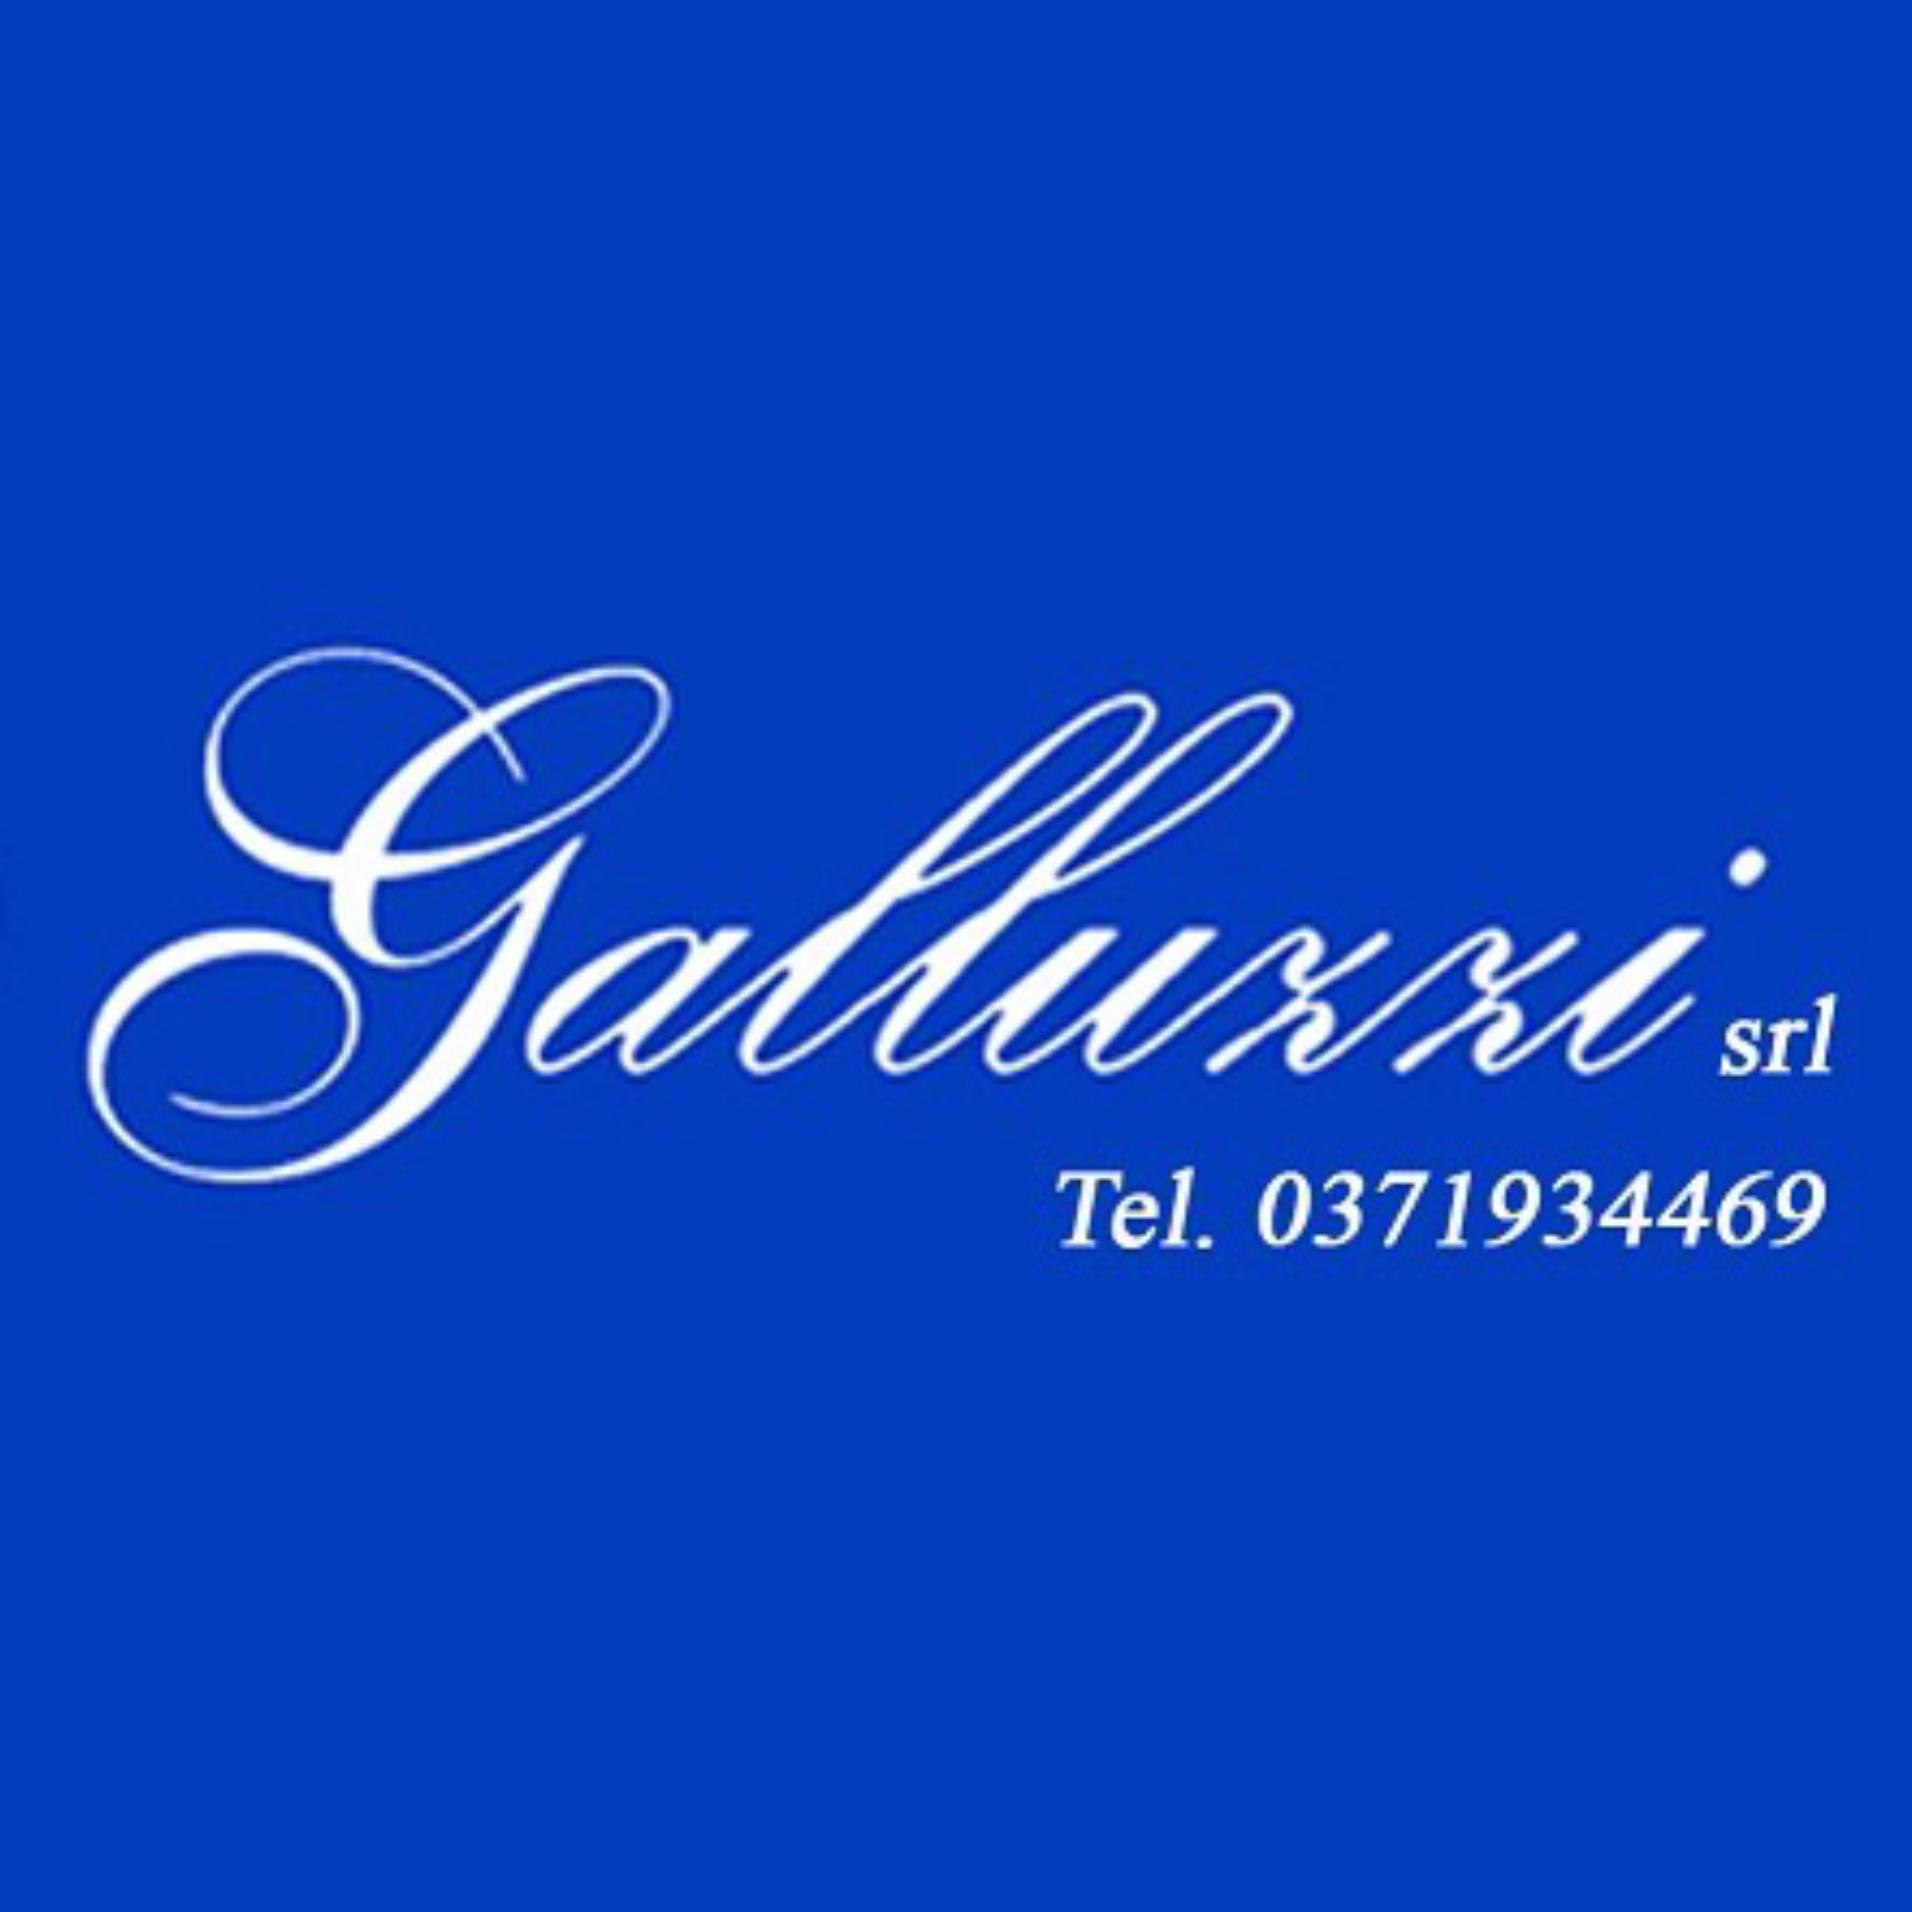 Impresa Galluzzi